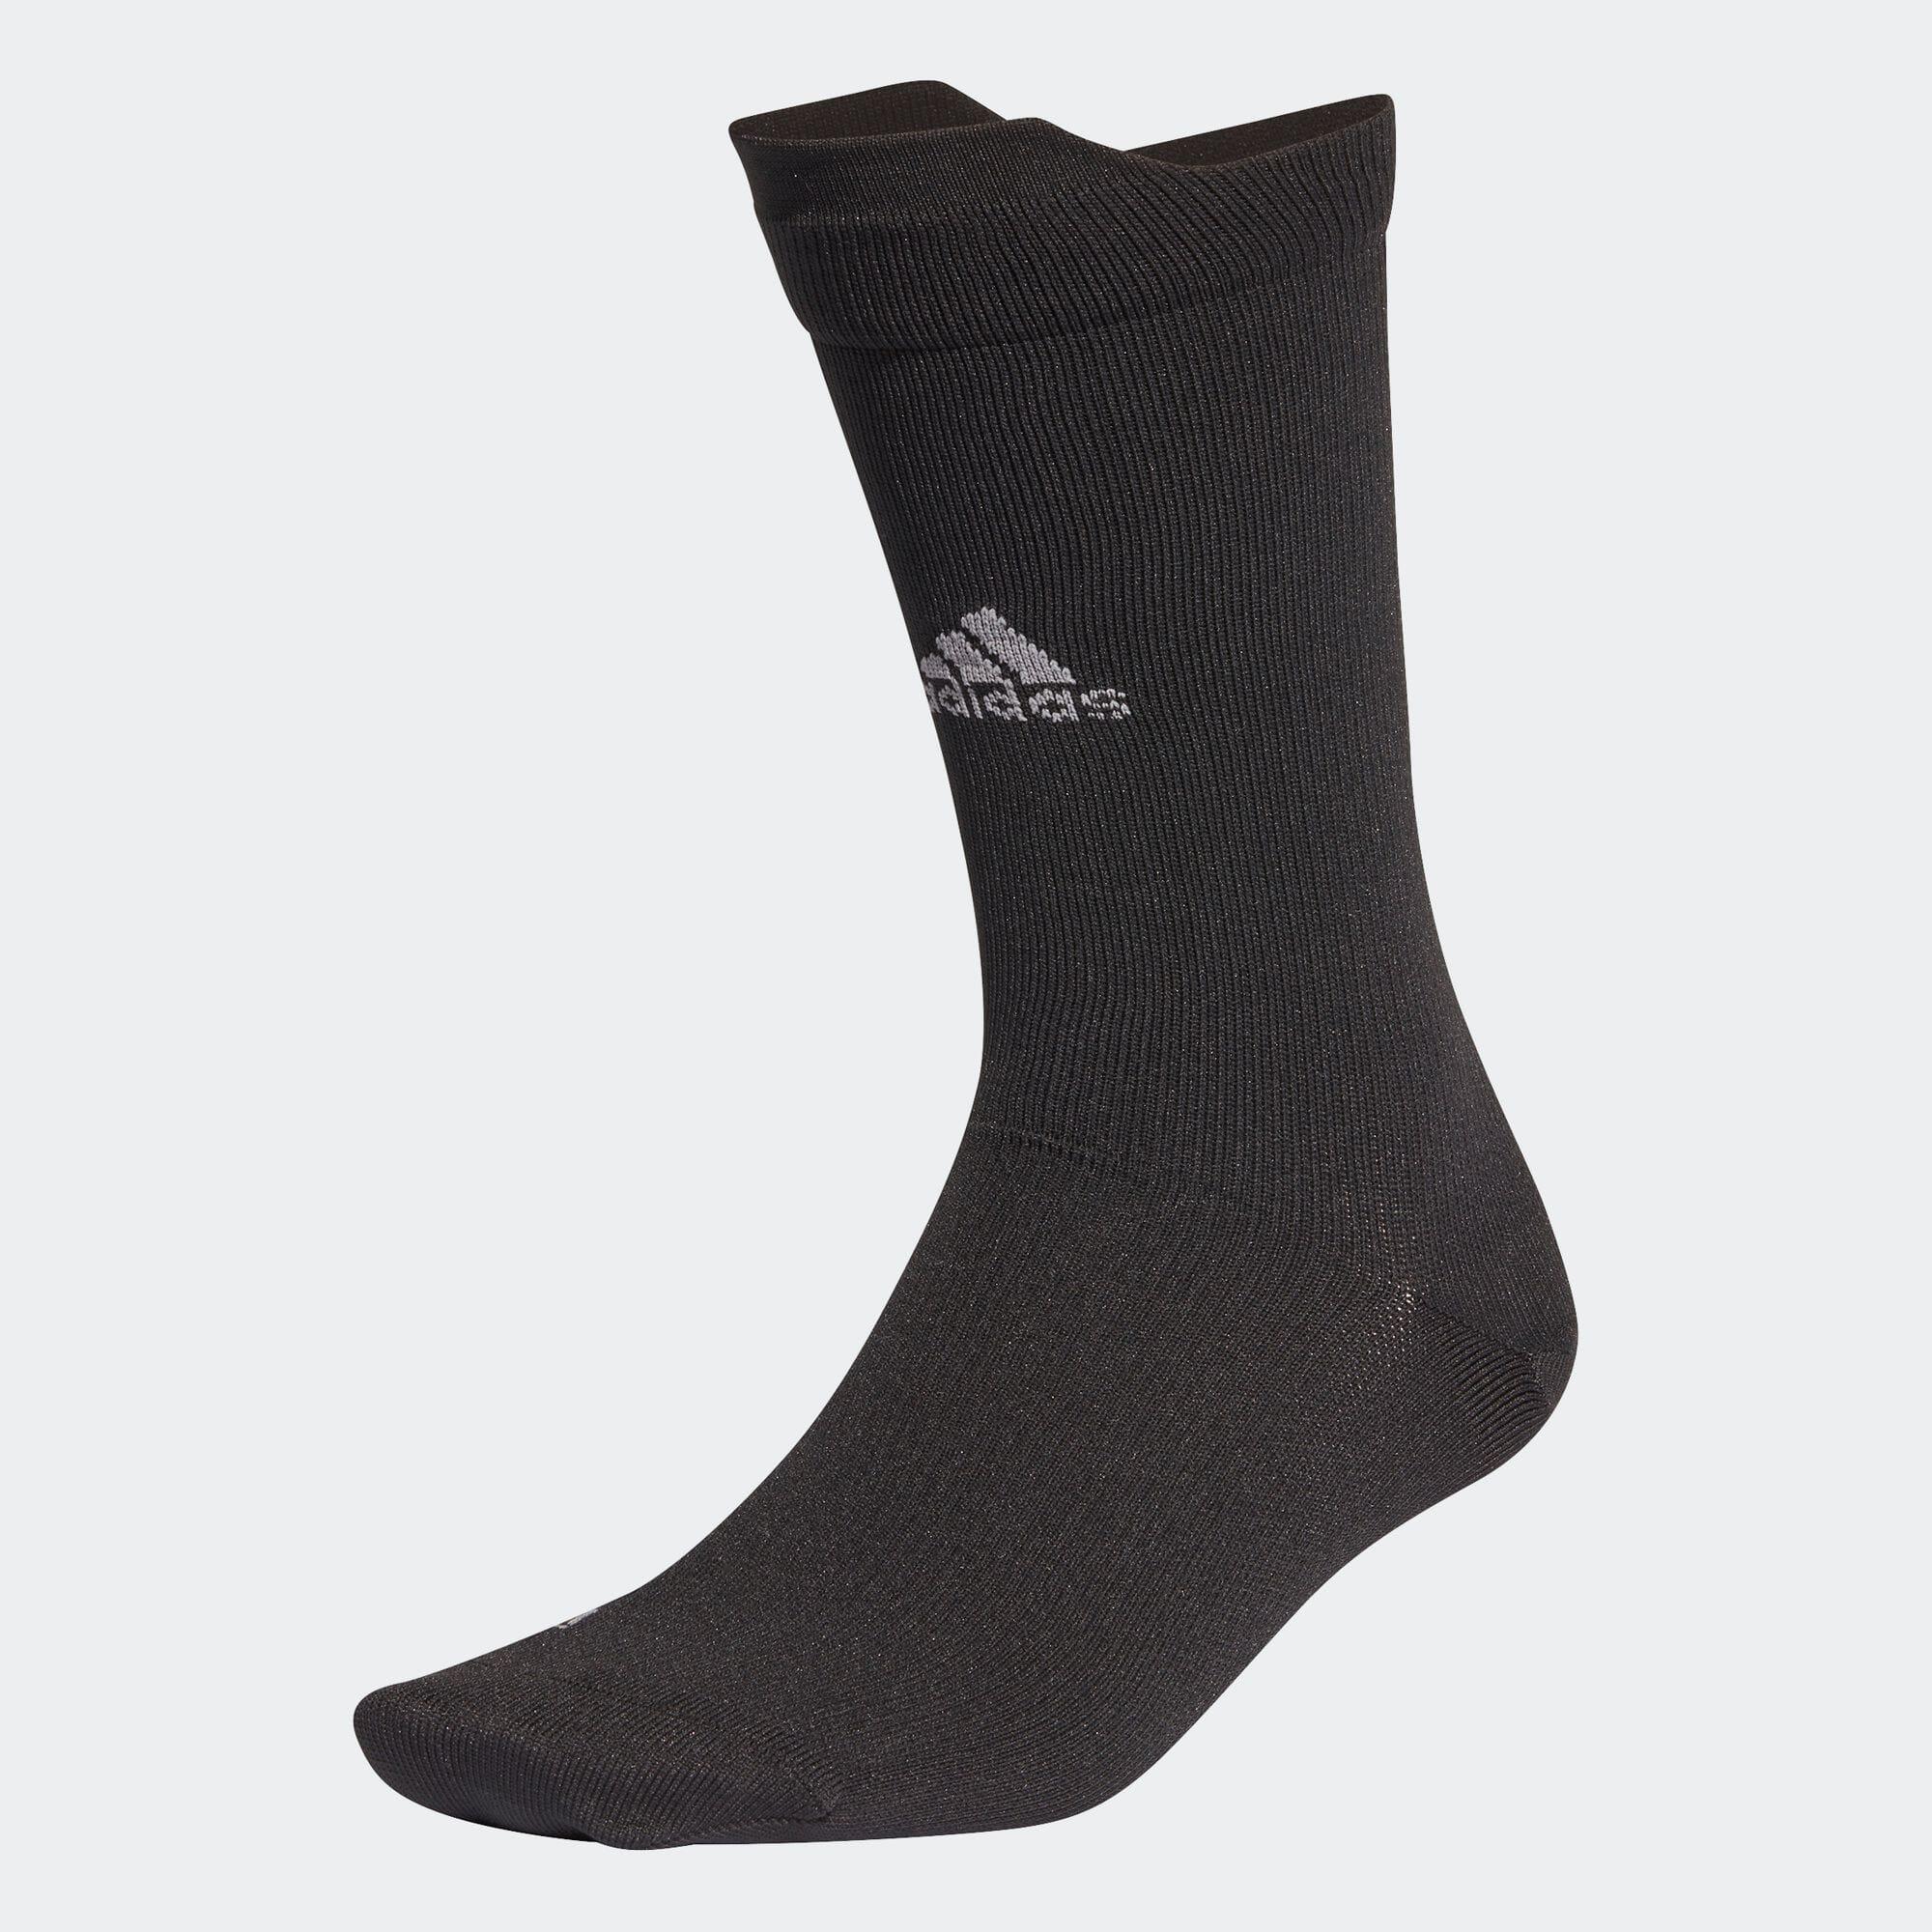 Alphaskin ウルトラライト パフォーマンス リフレクティブ クルーソックス / Alphaskin Ultralight Performance Reflective Crew Socks